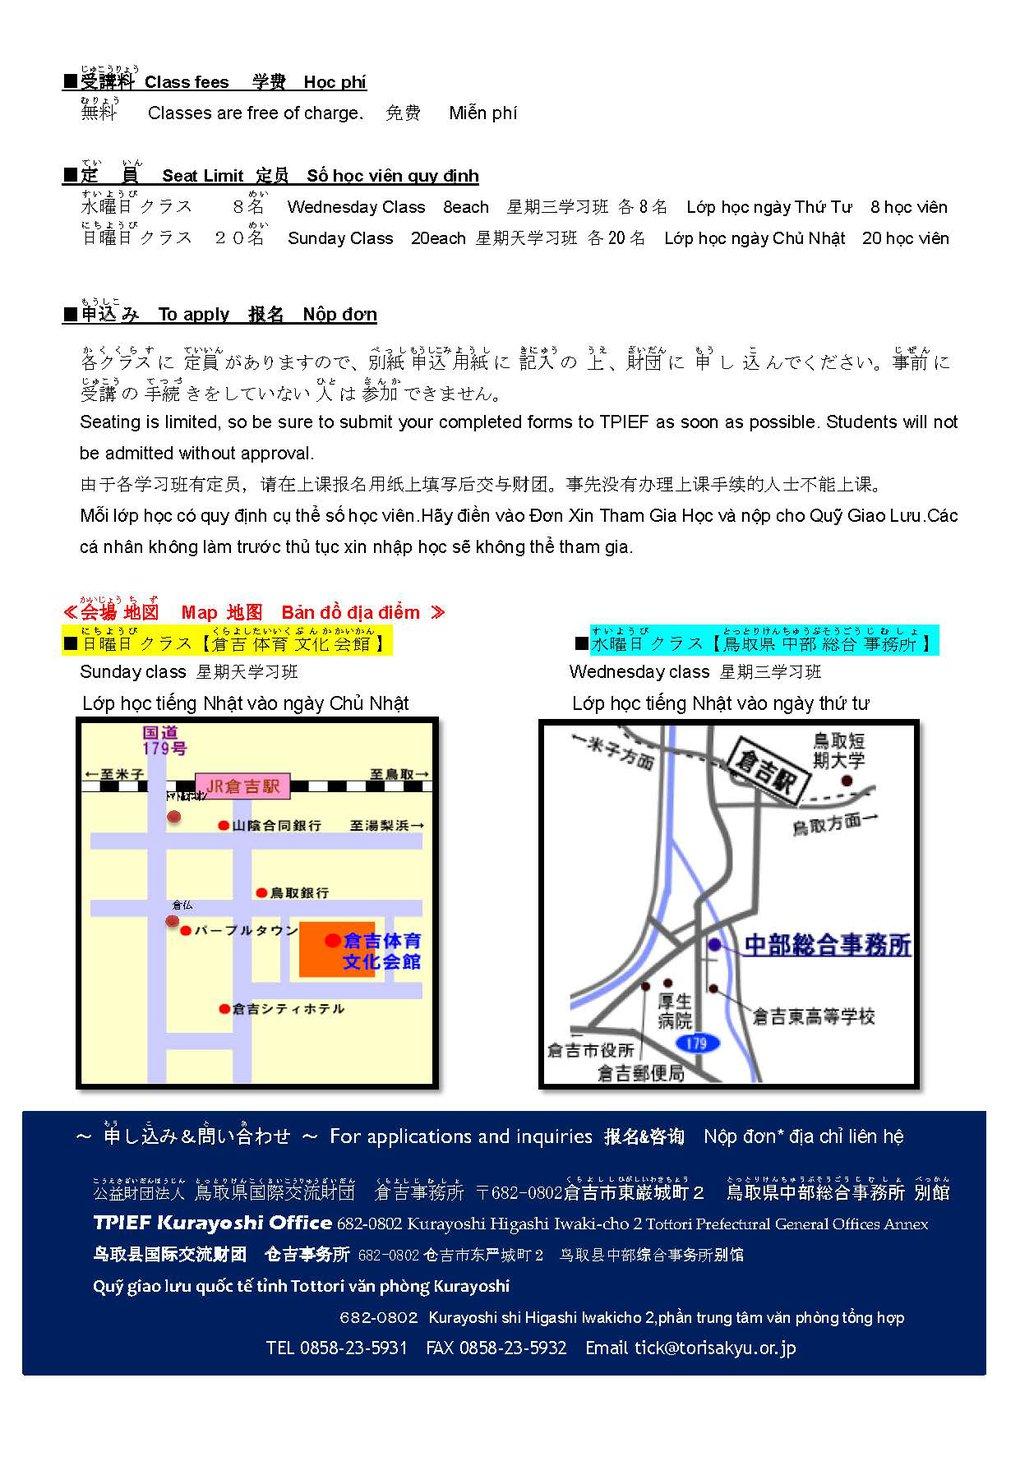 R2日本語クラス(第2期)チラシ_ページ_2.jpg